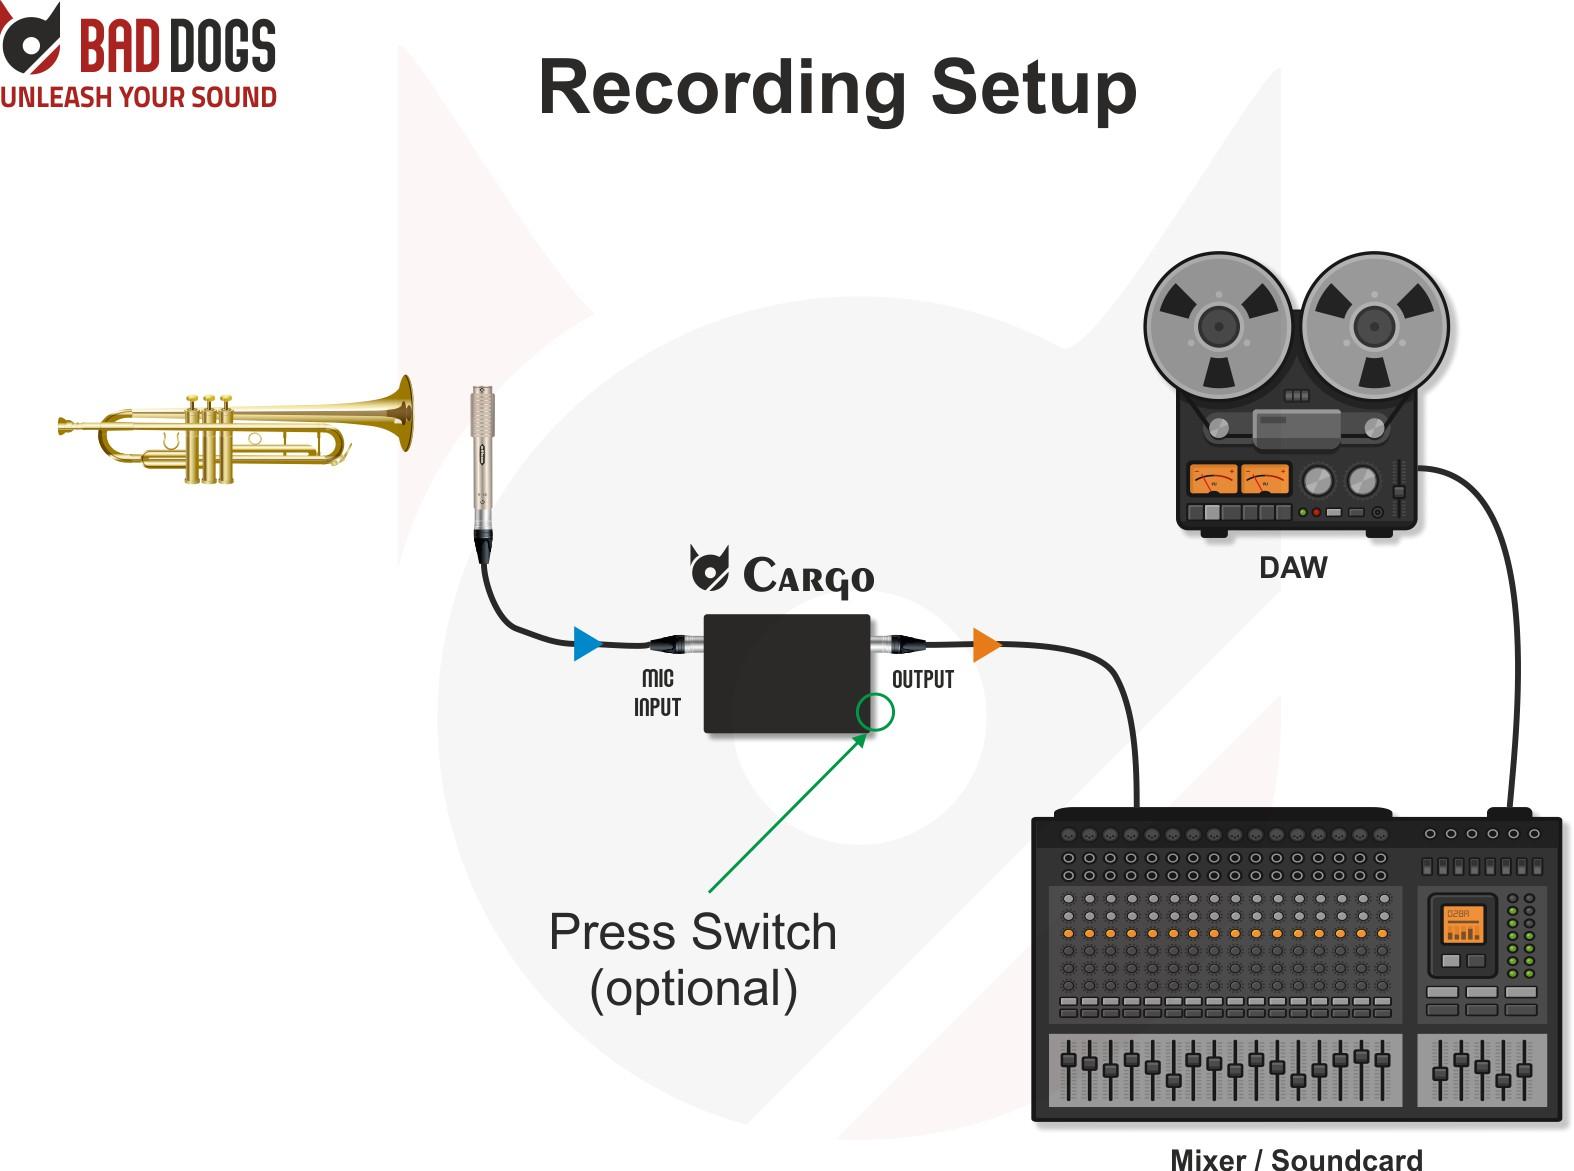 Cargo use case recording setup 2